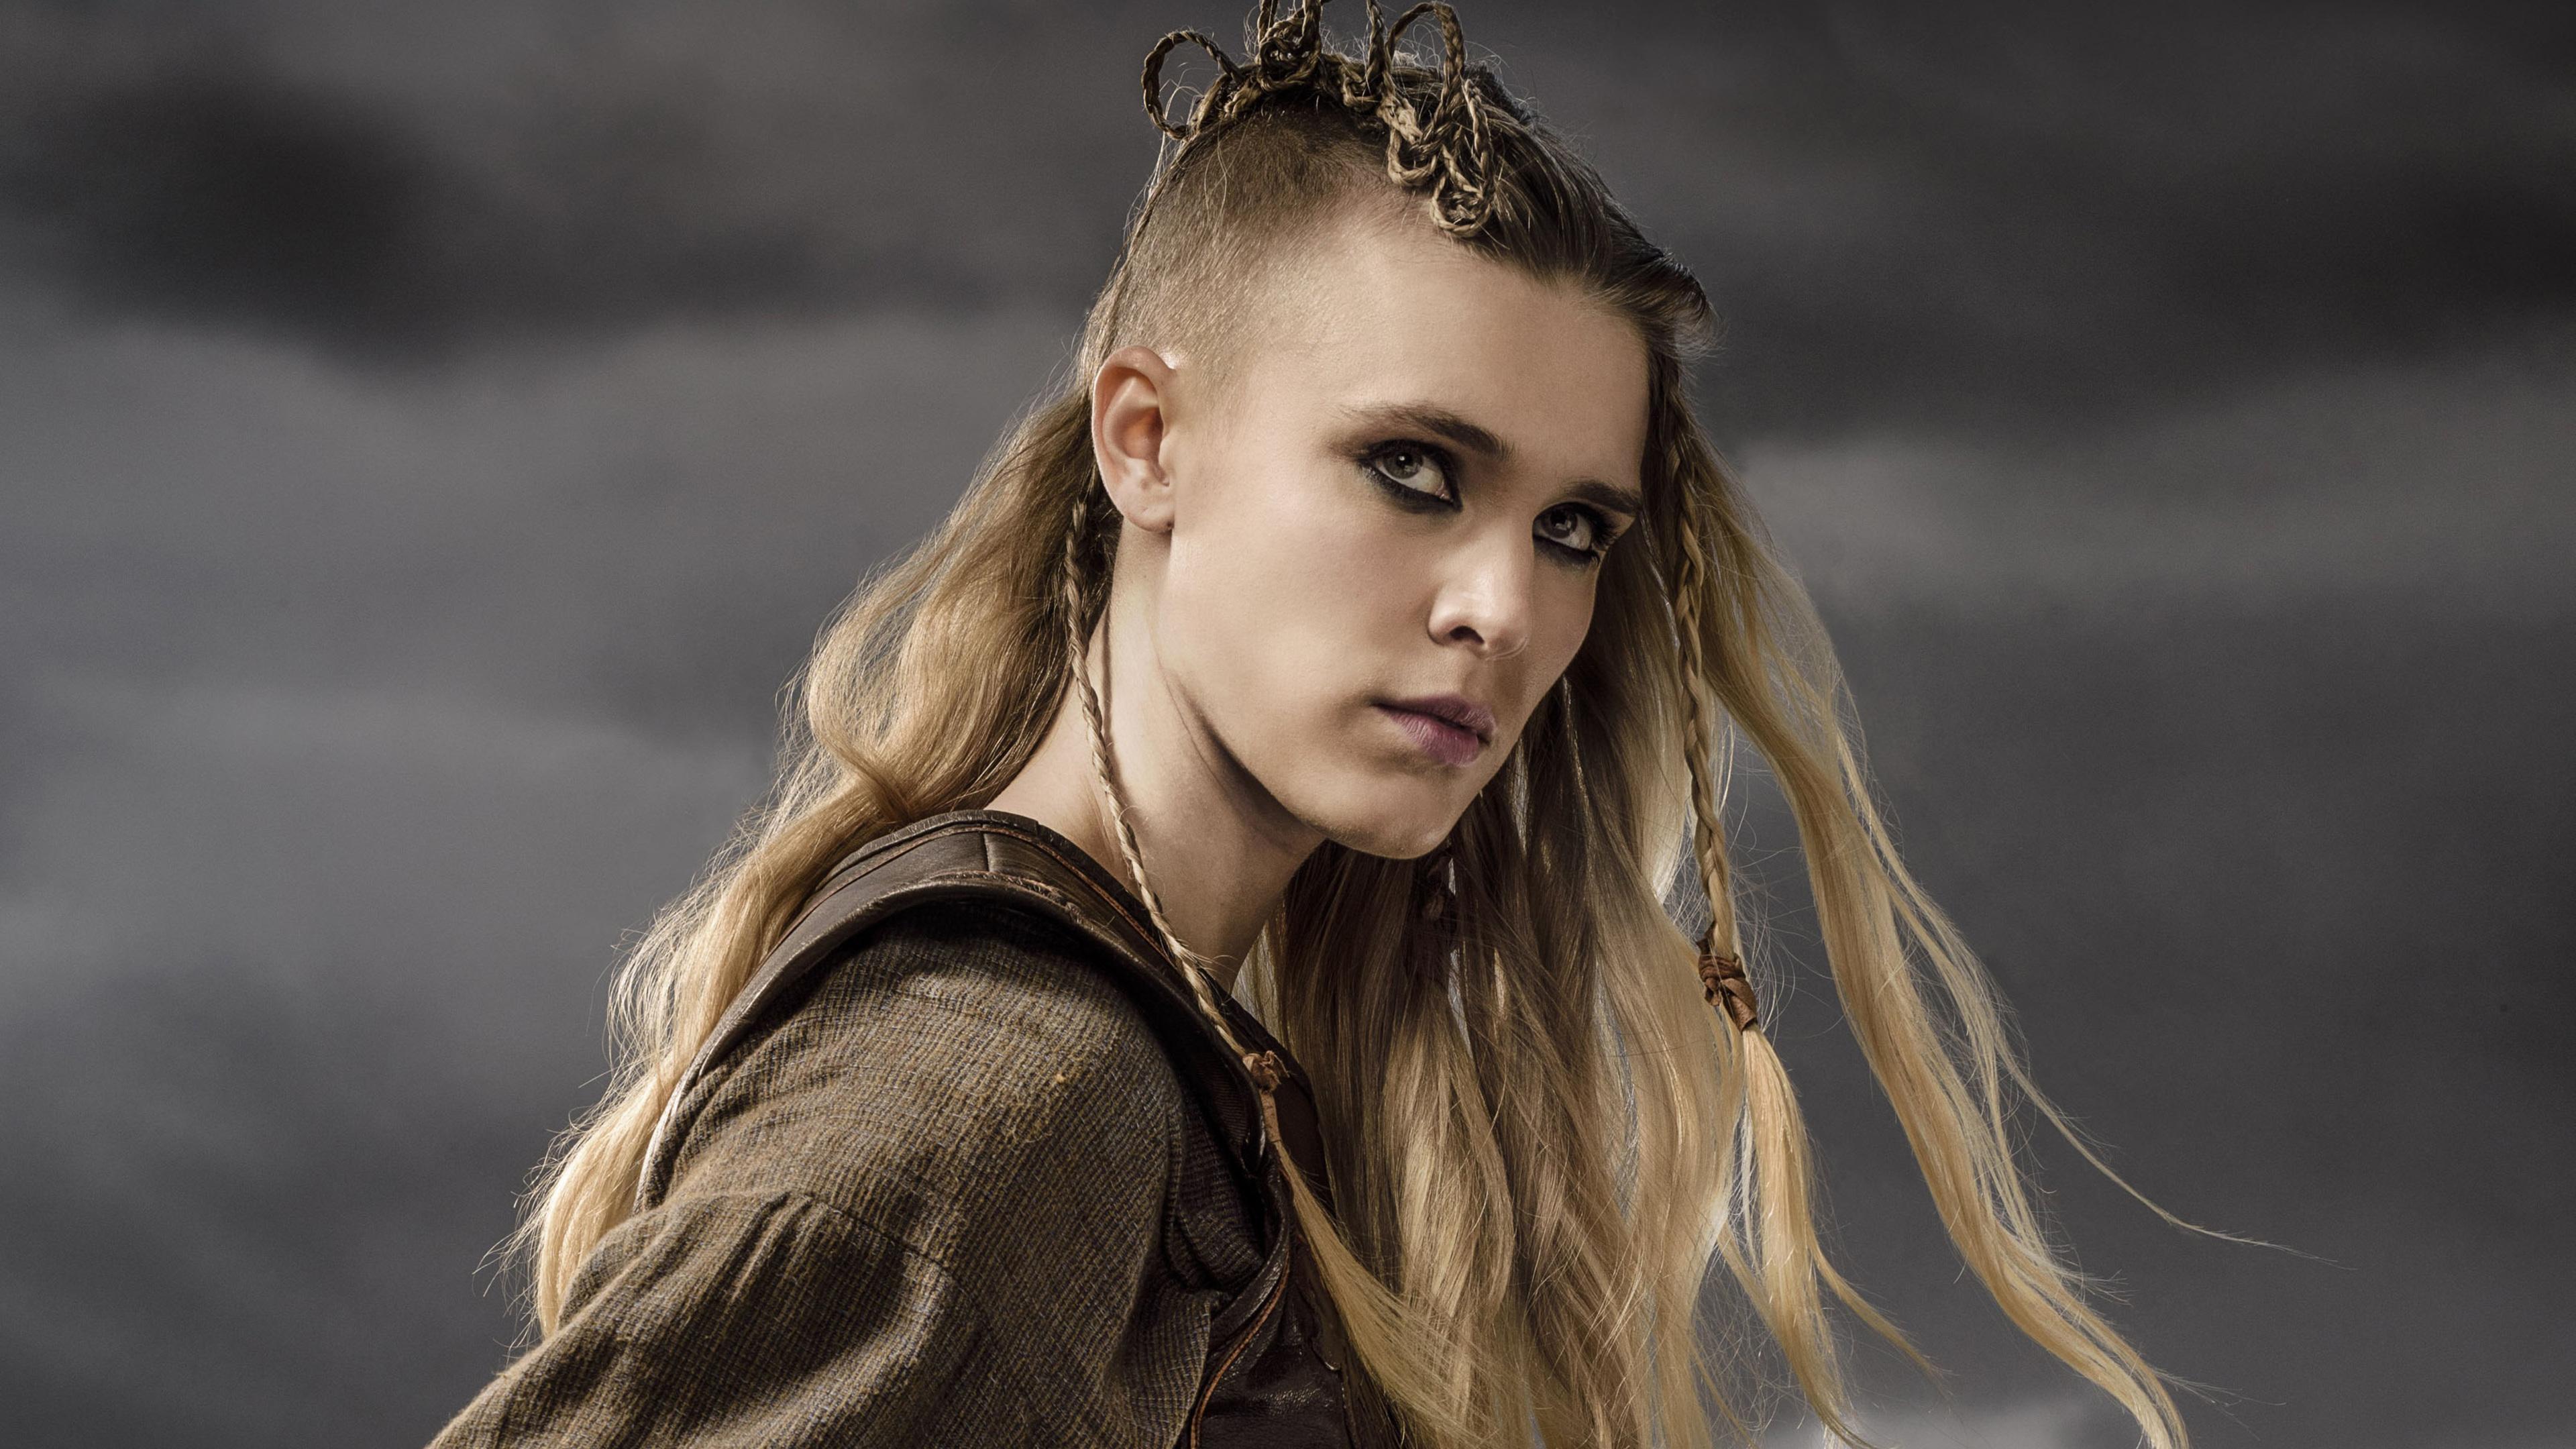 картинки актрис викингов виды